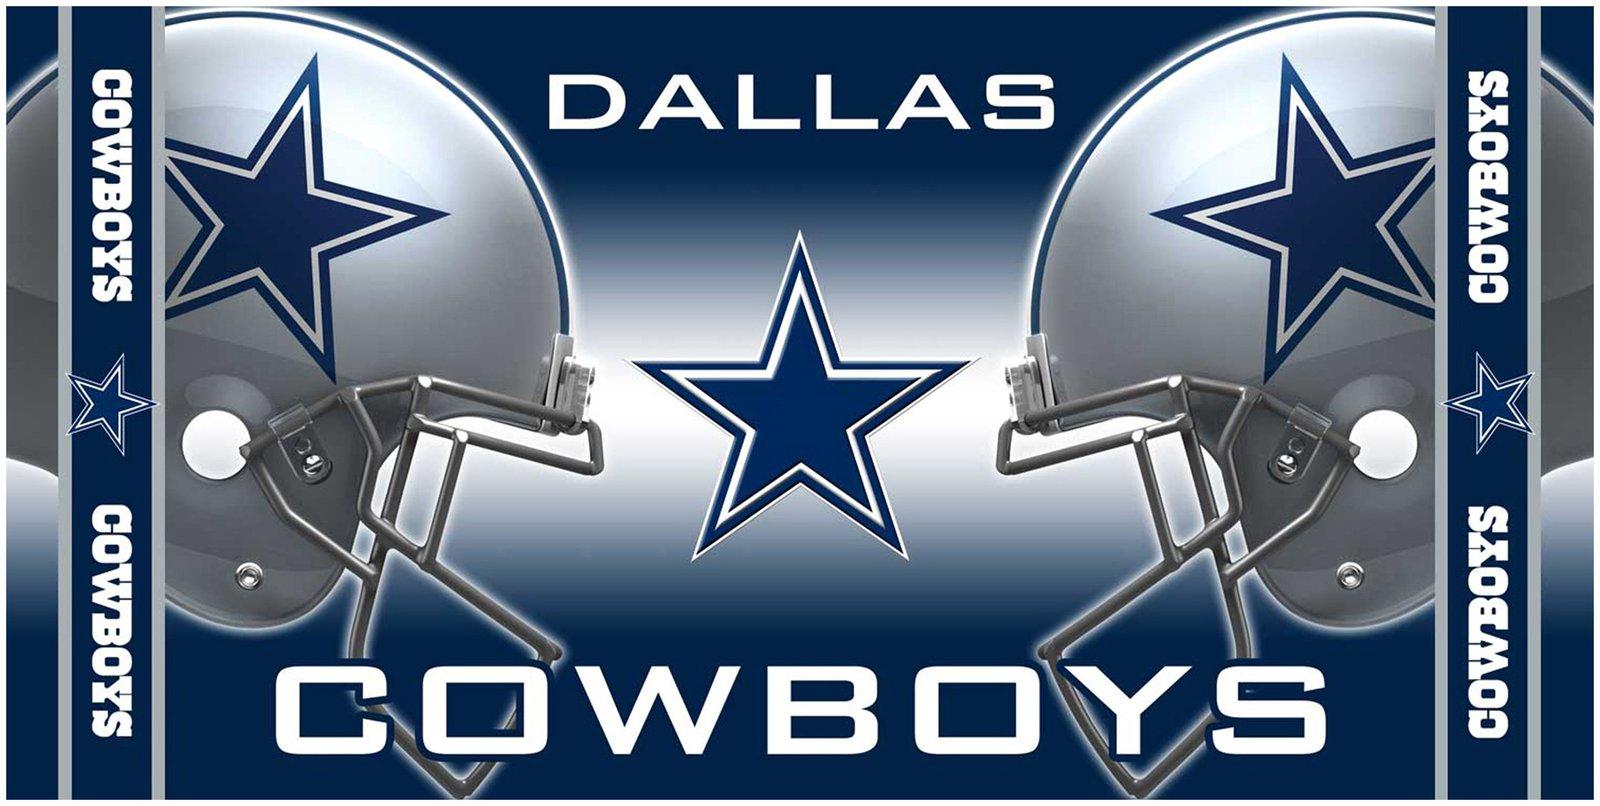 free dallas cowboys logo wallpaper wallpapersafari